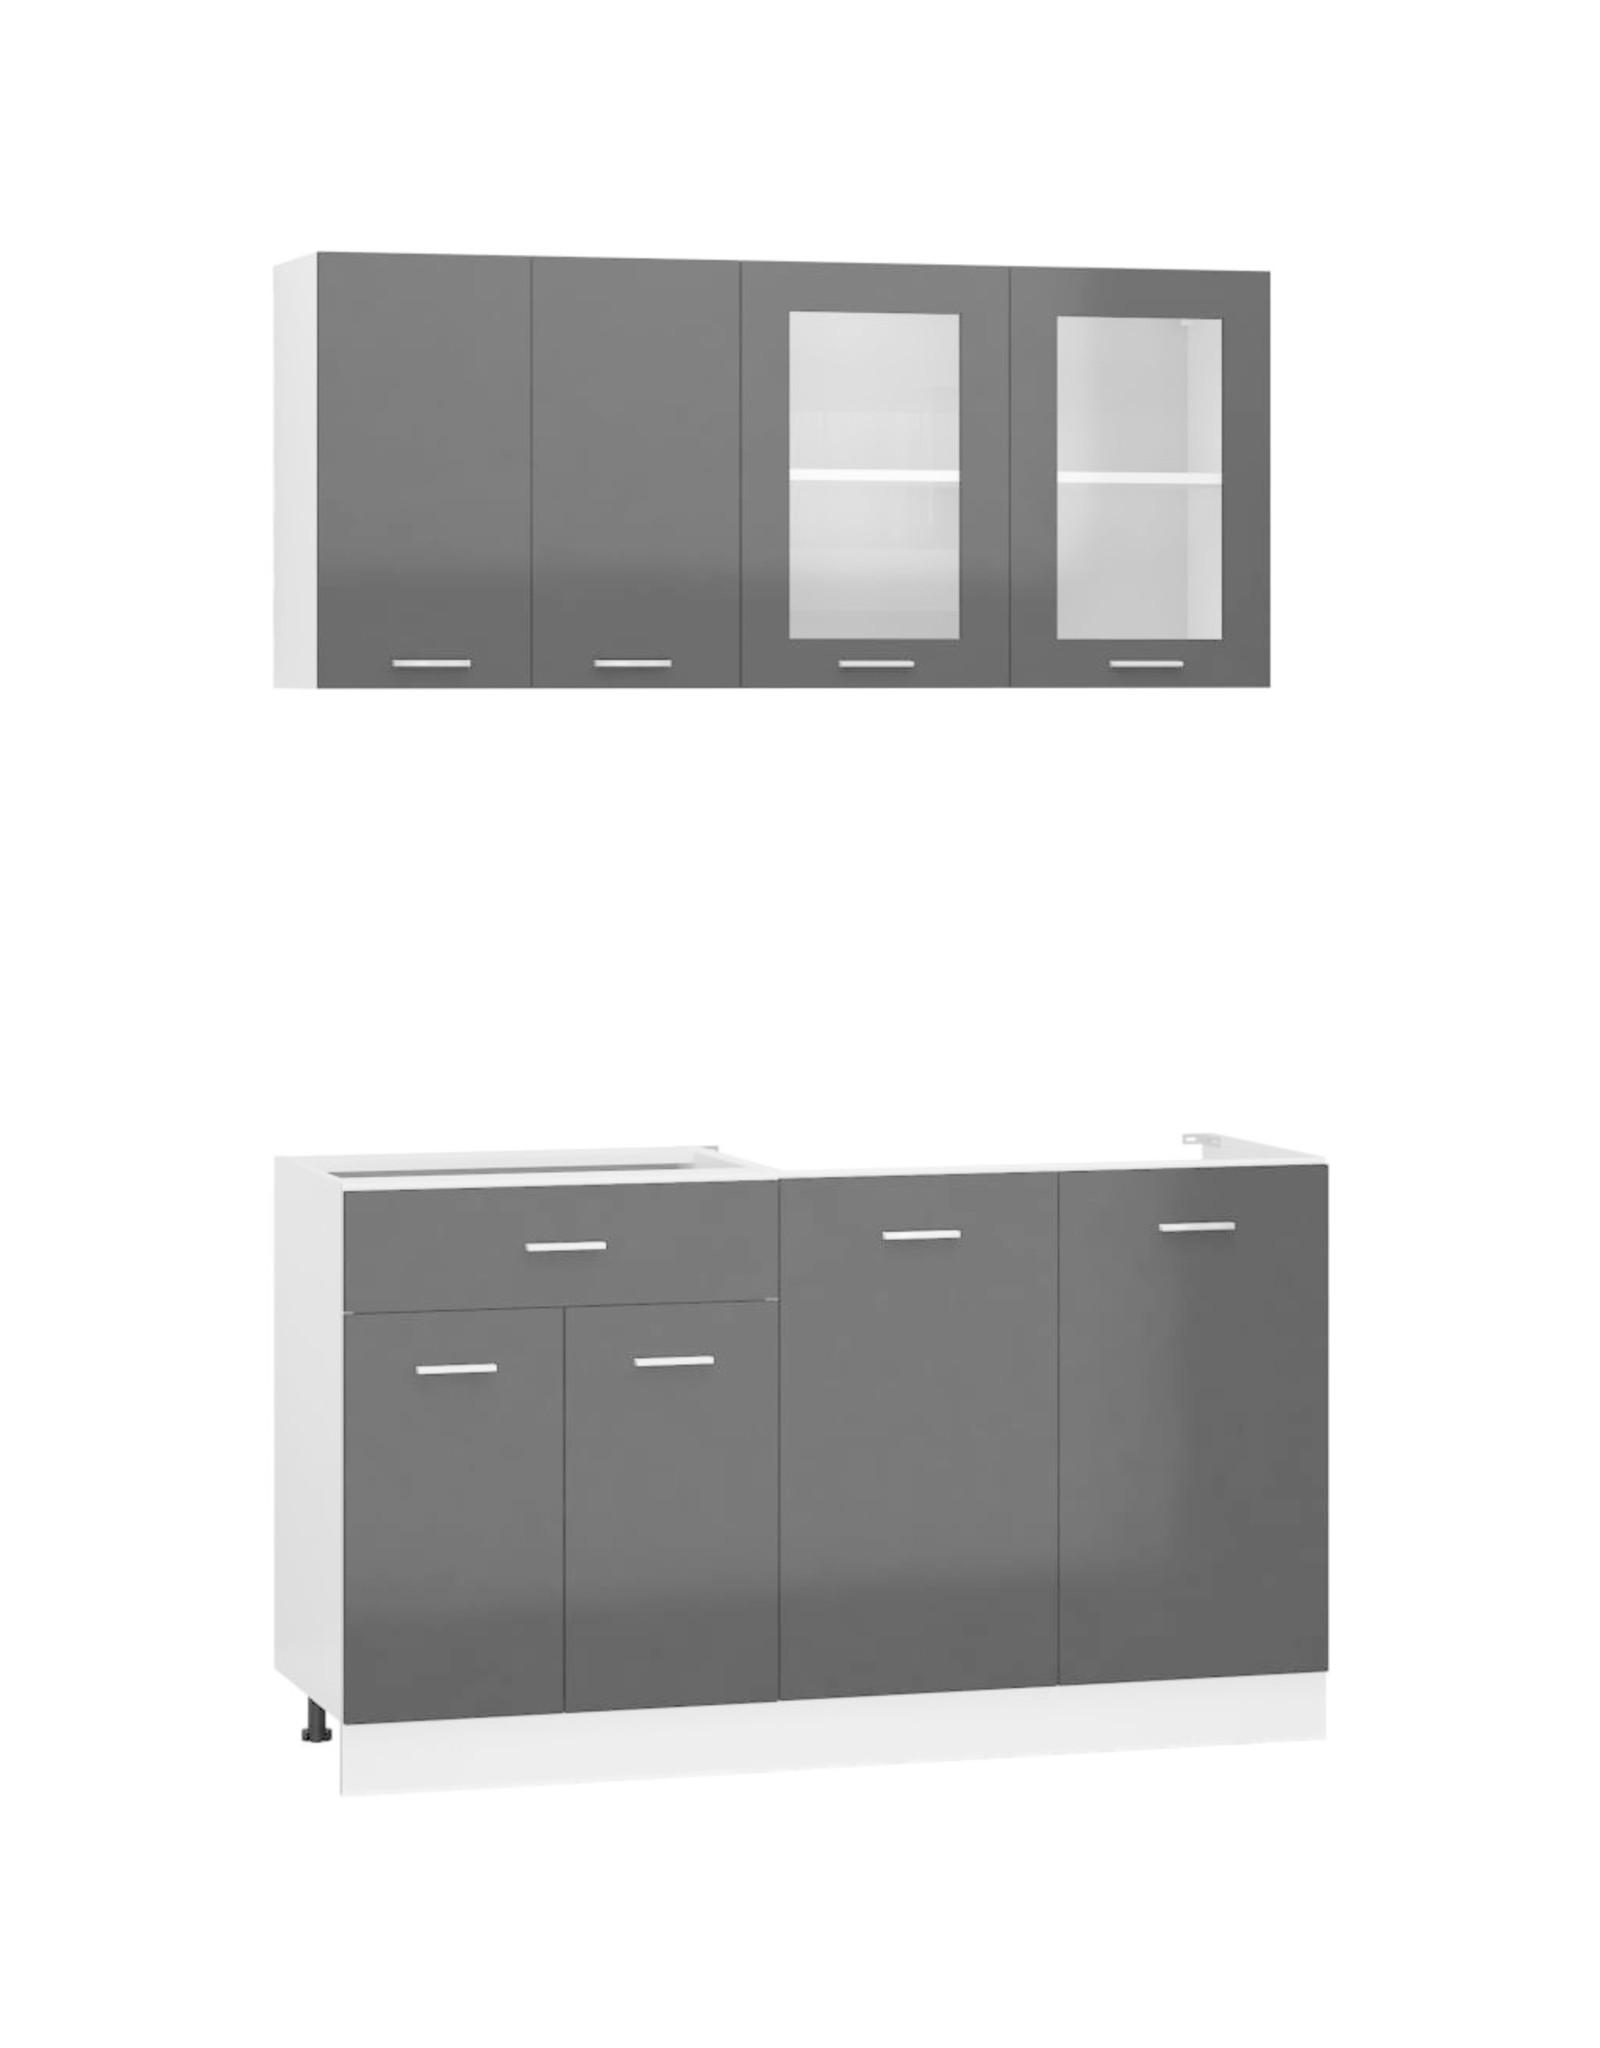 4-delige Keukenkastenset spaanplaat hoogglans zwart